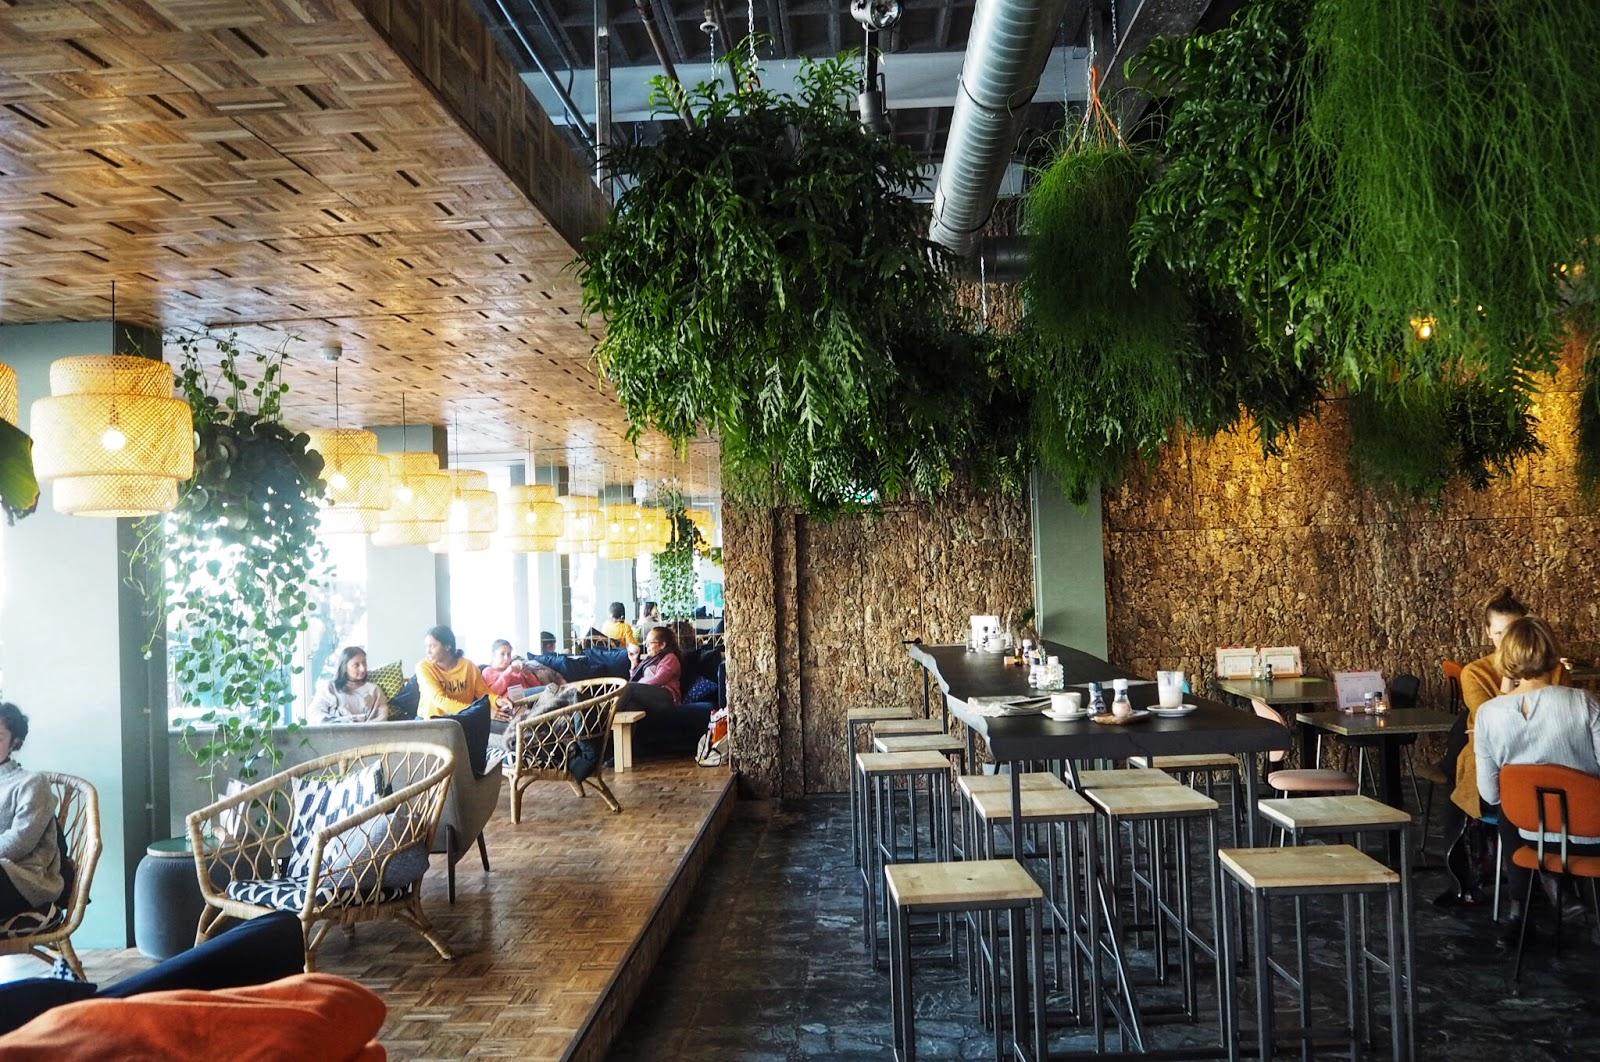 Bleyenberg Restaurant The Hague